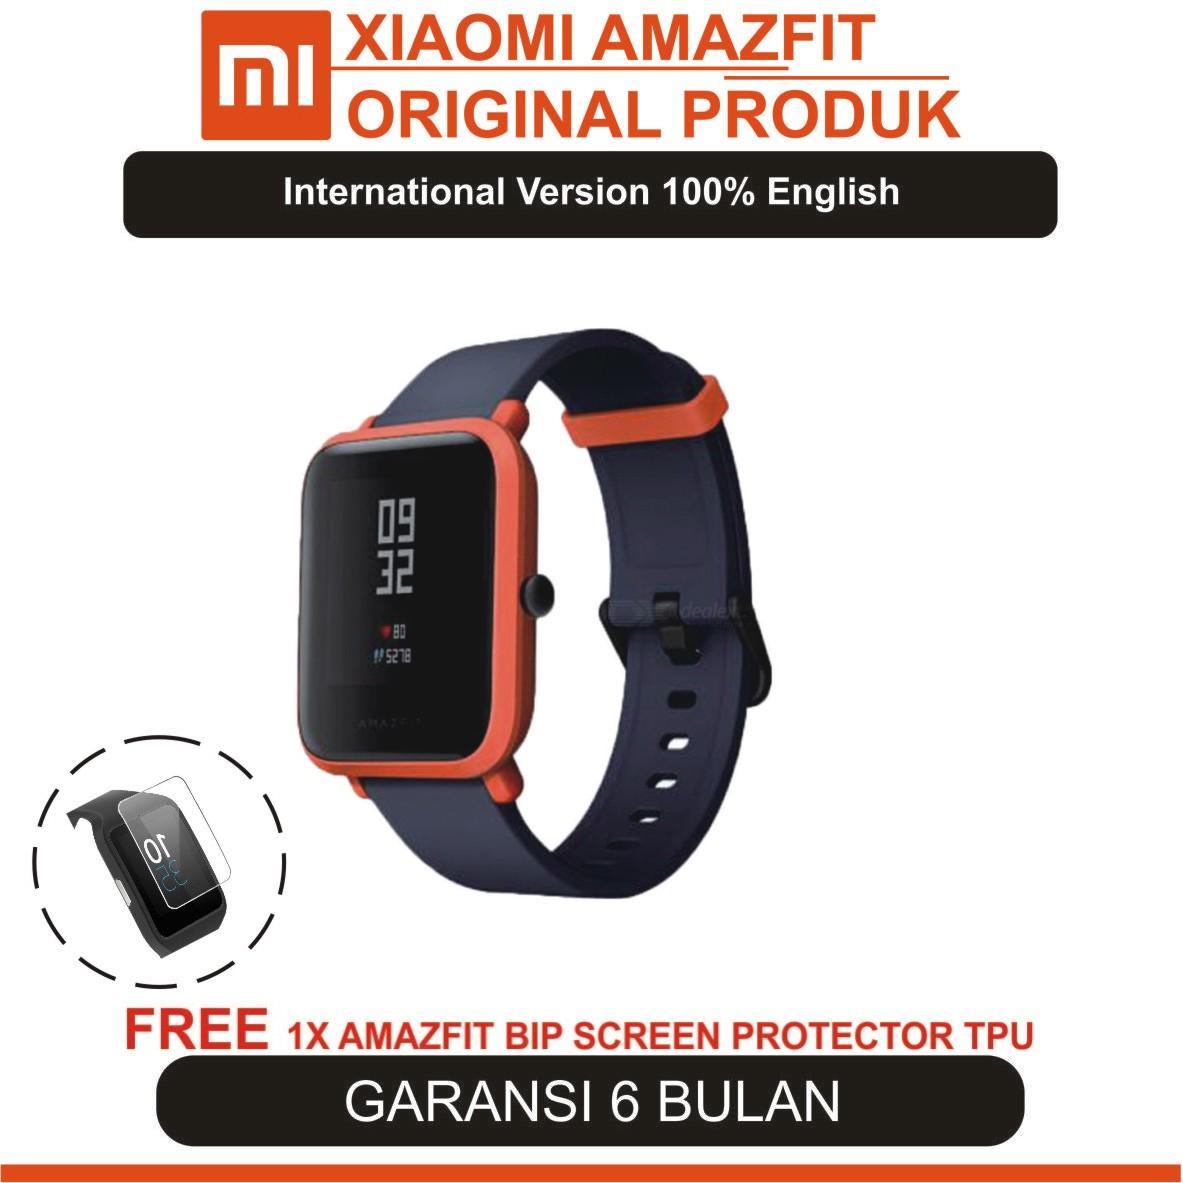 Harga Jam Tangan Xiaomi Terbaru 2018 Huami Amazfit Cor International Version Hitam Smart Watch Bip Bit Pace Waterproof Gps Compass English Garansi Resmi